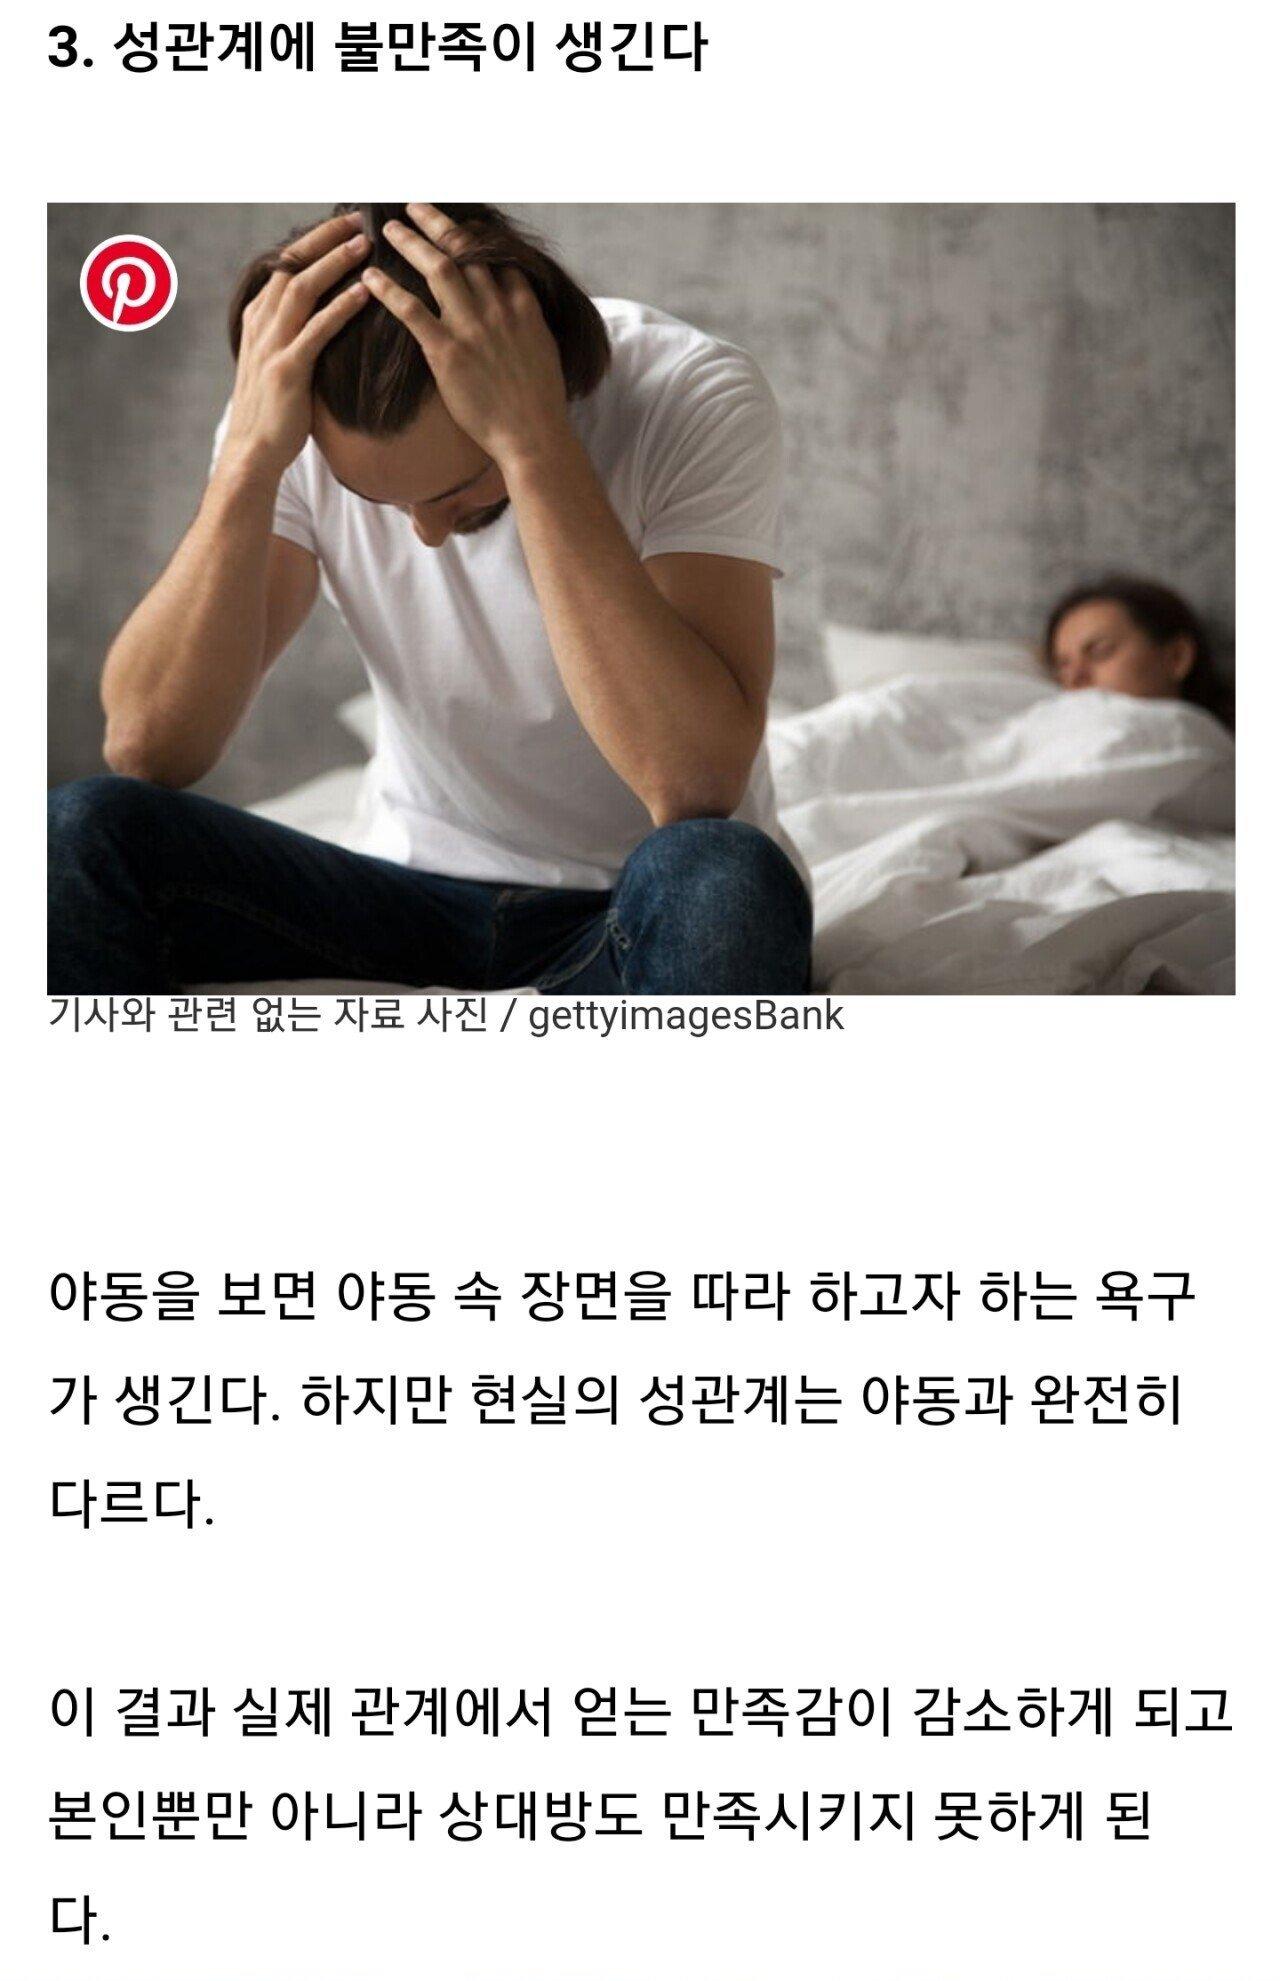 pic_005.jpg 야동에 중독된 당신이 겪을 10가지 증상...JPG